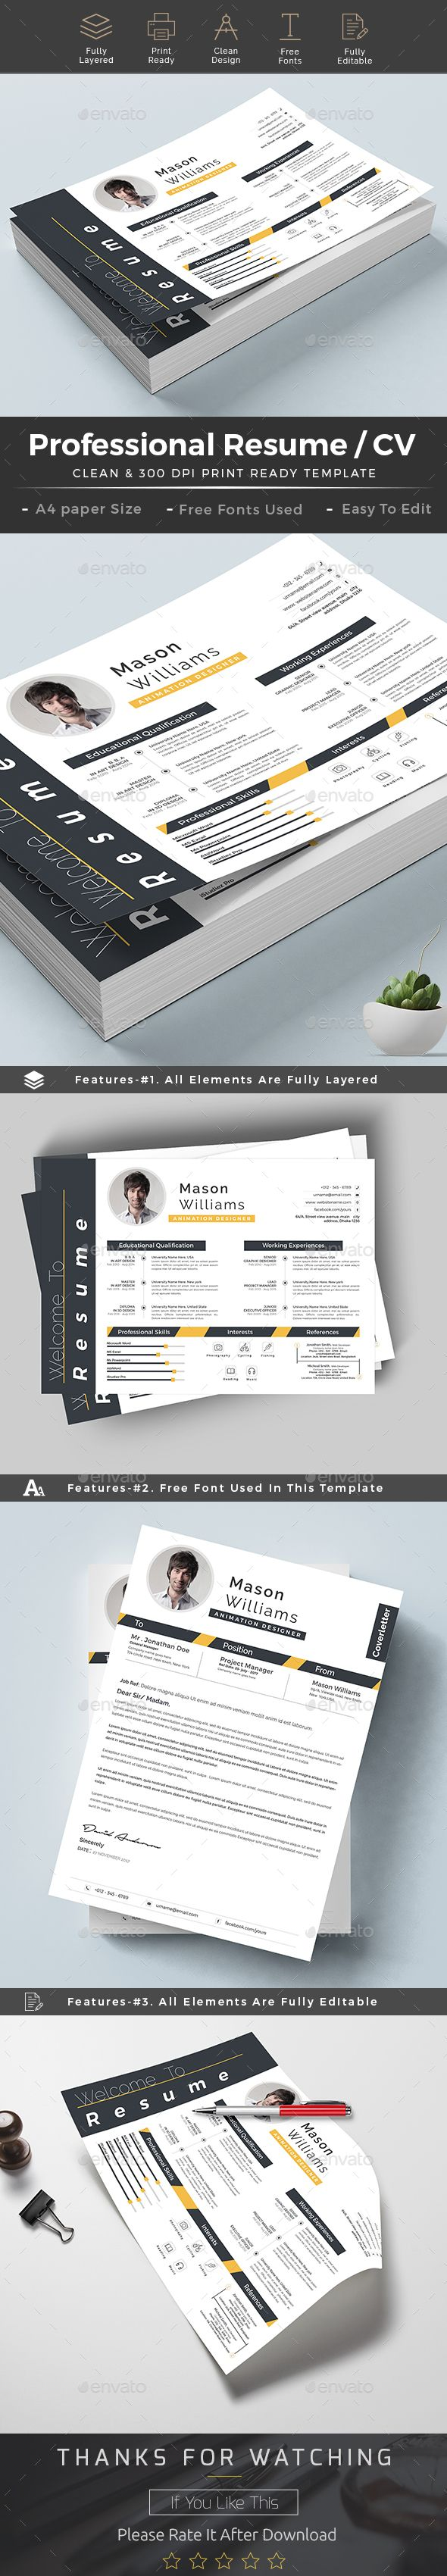 Resume Landscape Design Template - Landscape Resumes Design Stationery Template PSD. Download here: https://graphicriver.net/item/resume/19362080?ref=yinkira